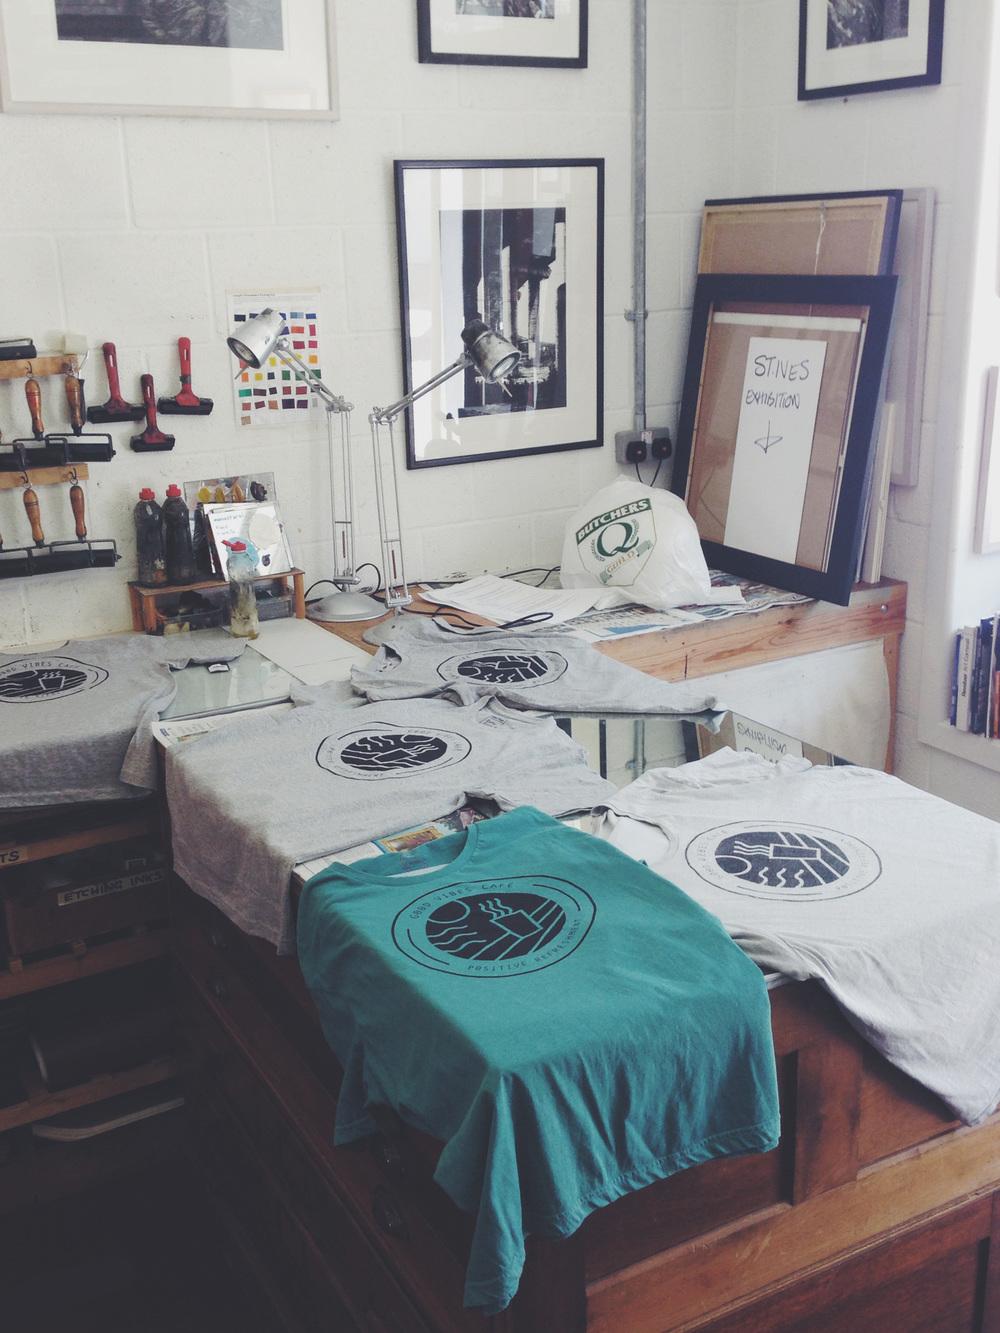 Good Vibes T-shirt Design